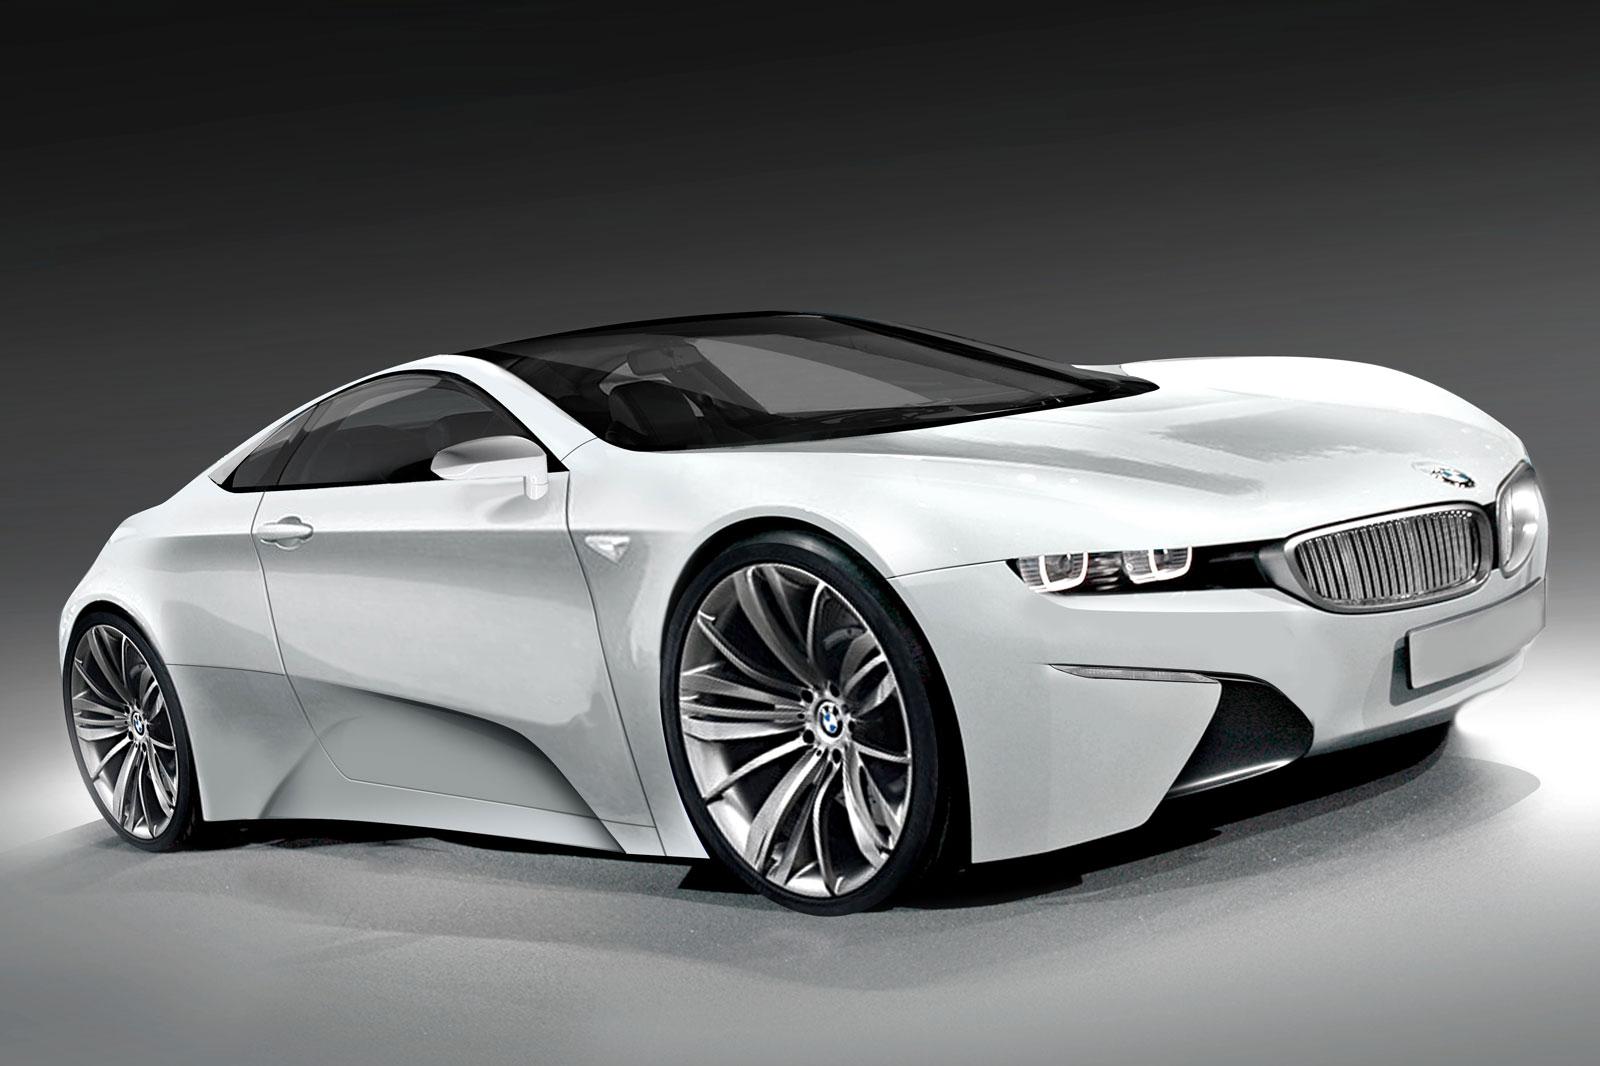 Bmw Latest Luxury Car Models 2012 Myclipta